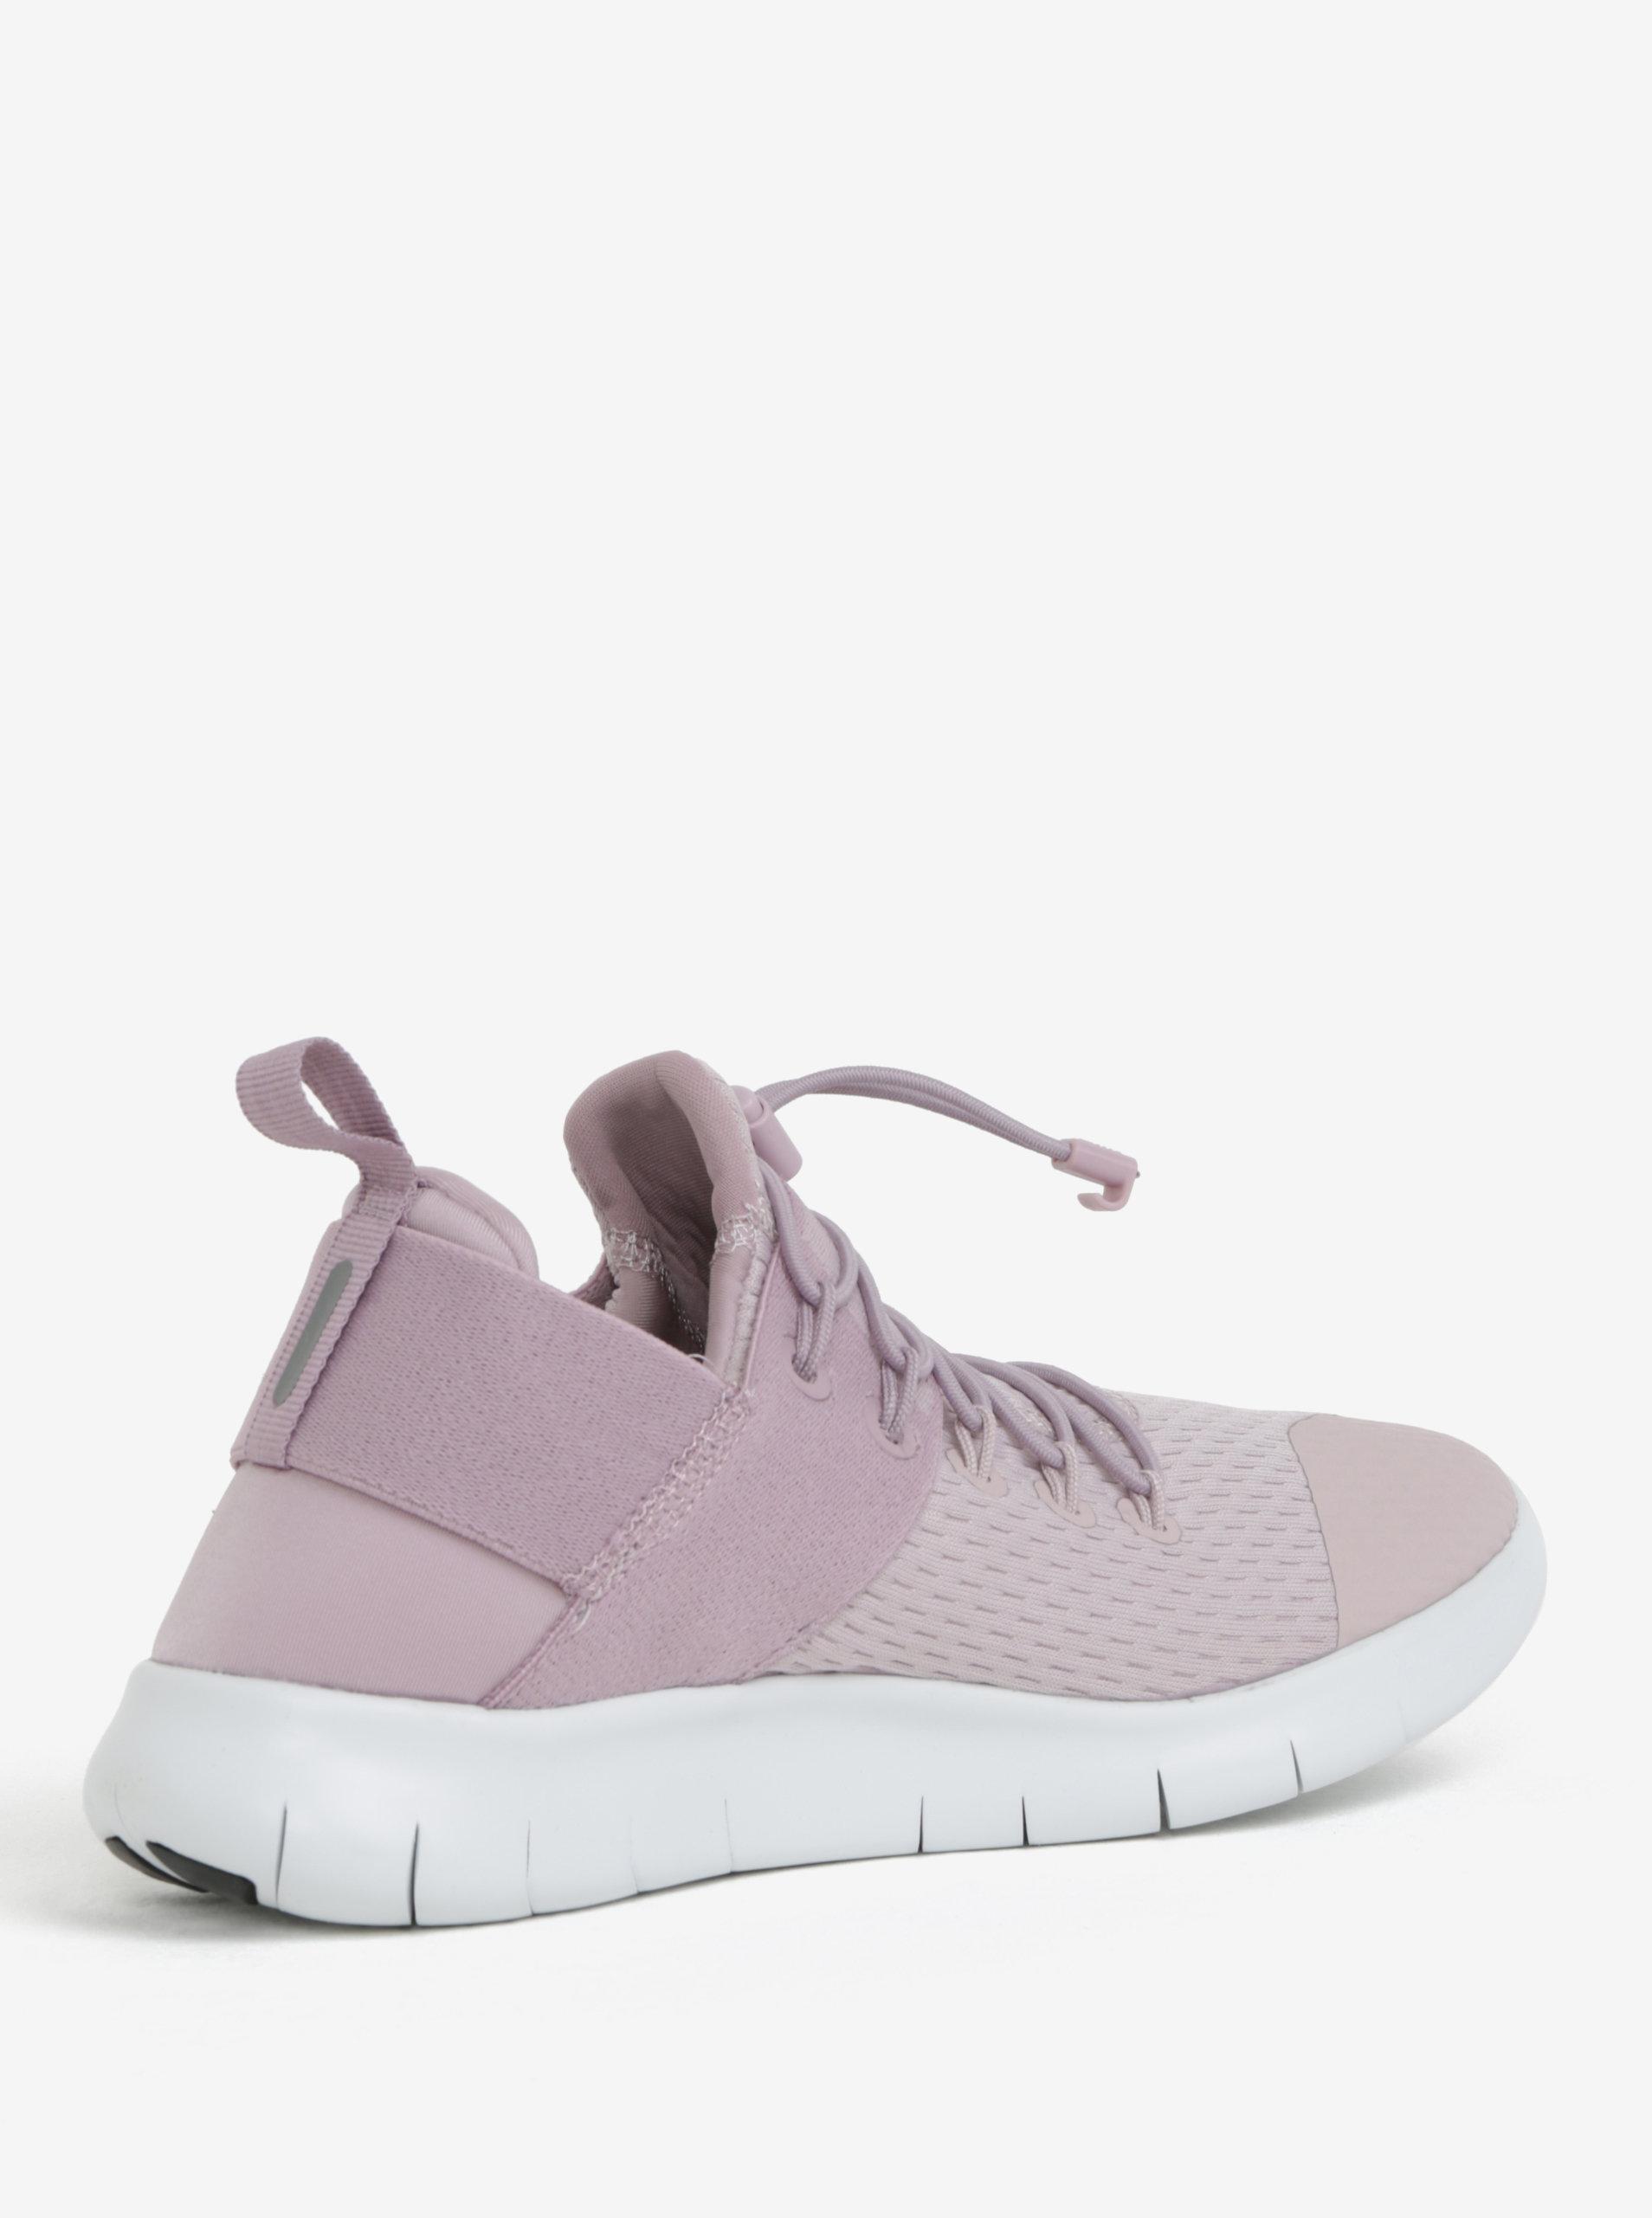 7bfc303744483 Svetlofialové dámske tenisky Nike Free RN Commuter   ZOOT.sk